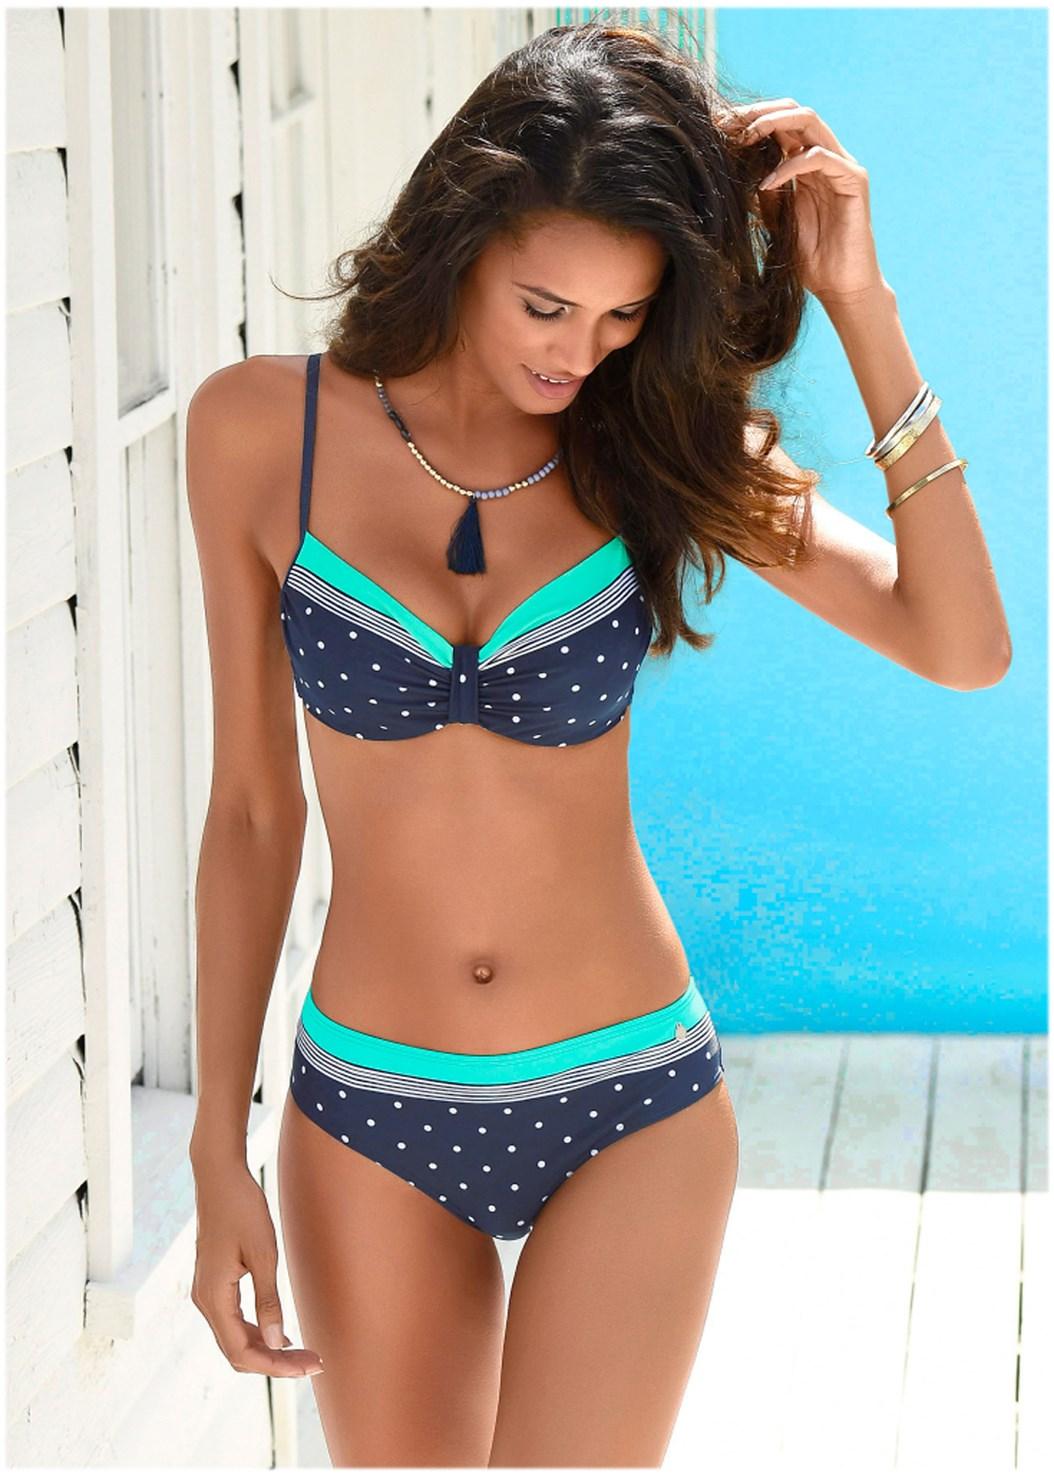 Mid Rise Bikini Bottom,Underwire Bikini Top,Underwire Tankini Set,Triangle String Bikini Top